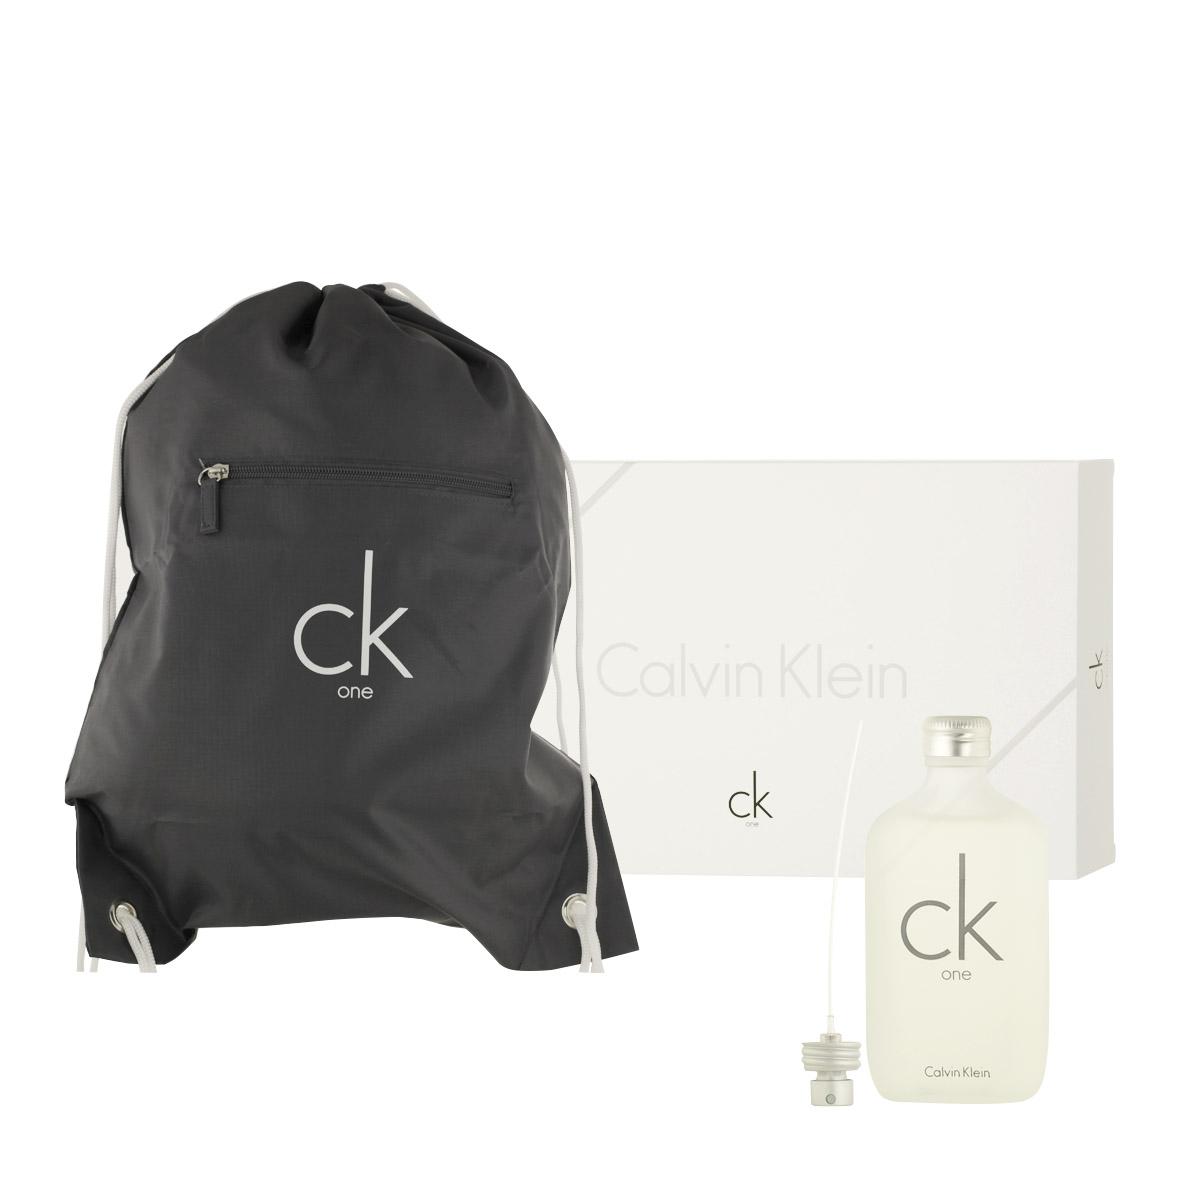 Calvin Klein CK One EDT 100 ml + vak na záda UNISEX